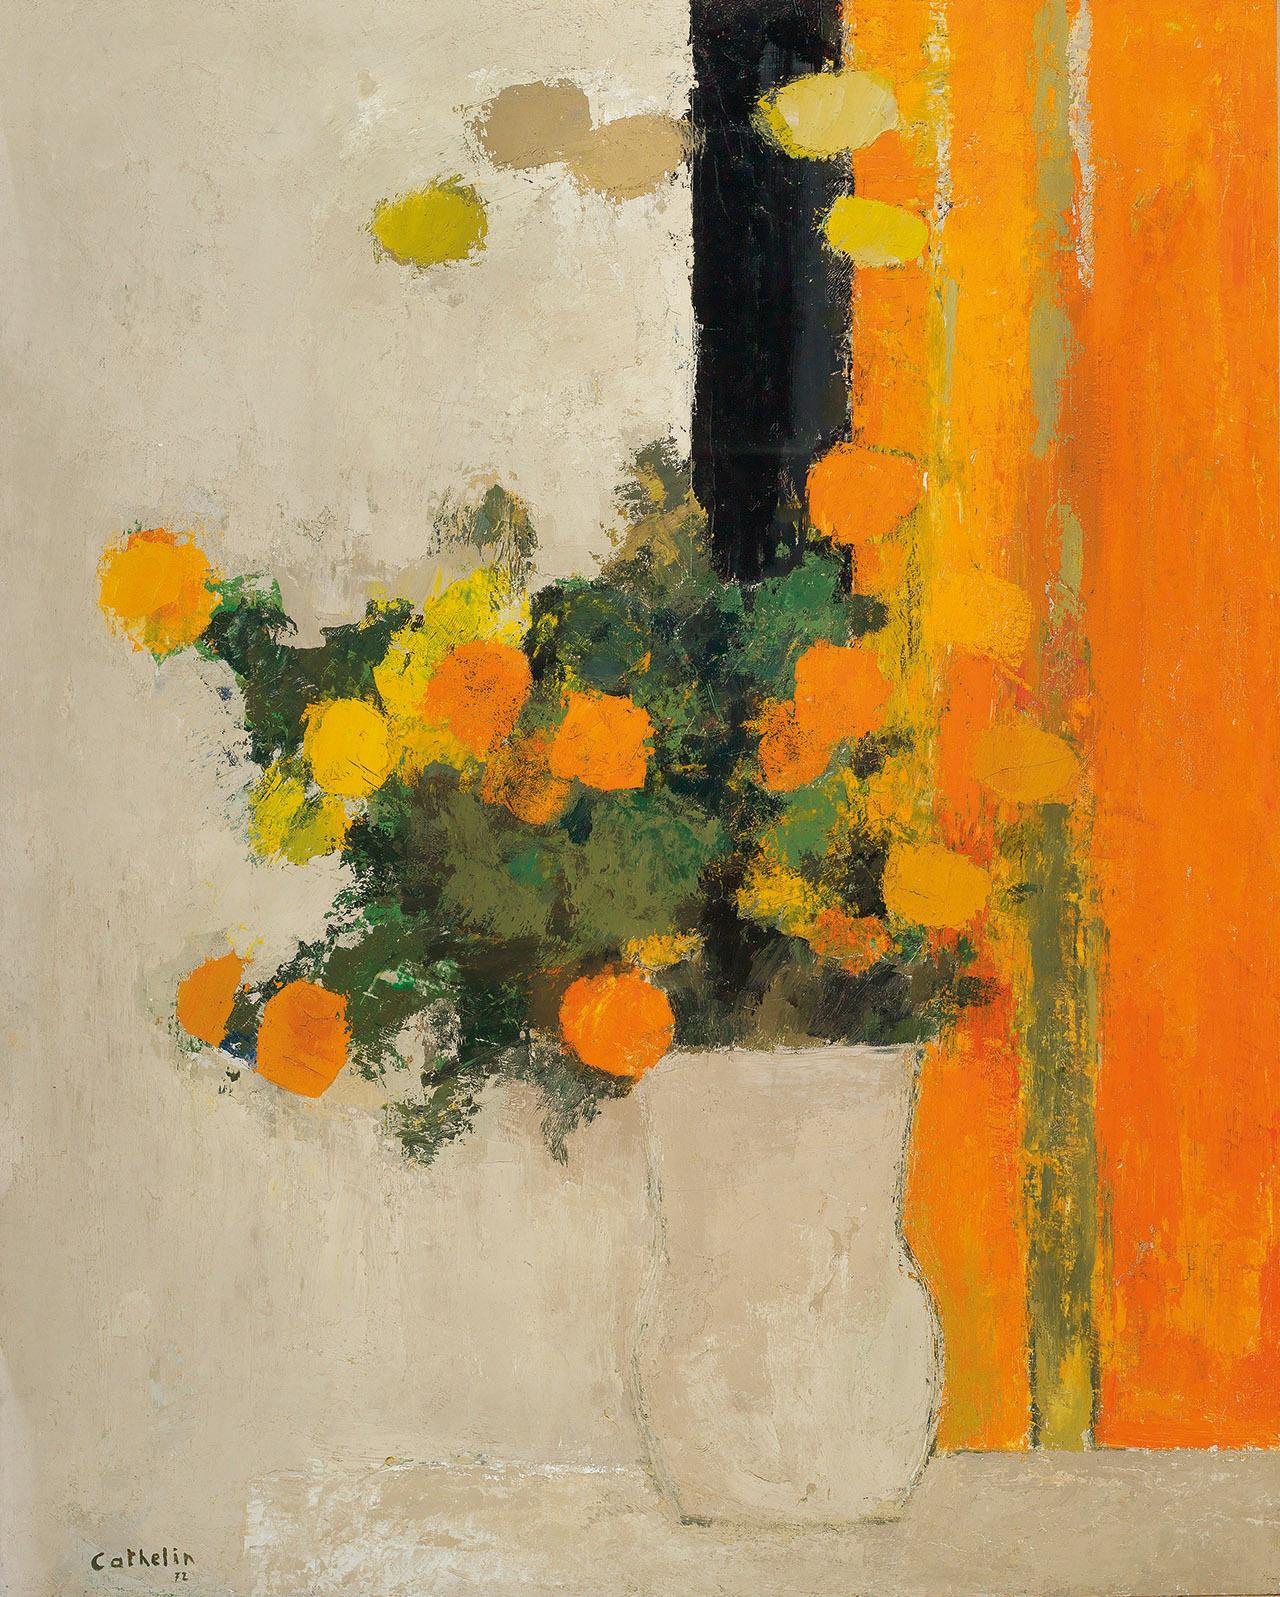 "igormaglica: "" Bernard Cathelin (1919-2004), Roses d'Inde des Rebattières, 1972. oil on canvas, 162 x 130 cm """